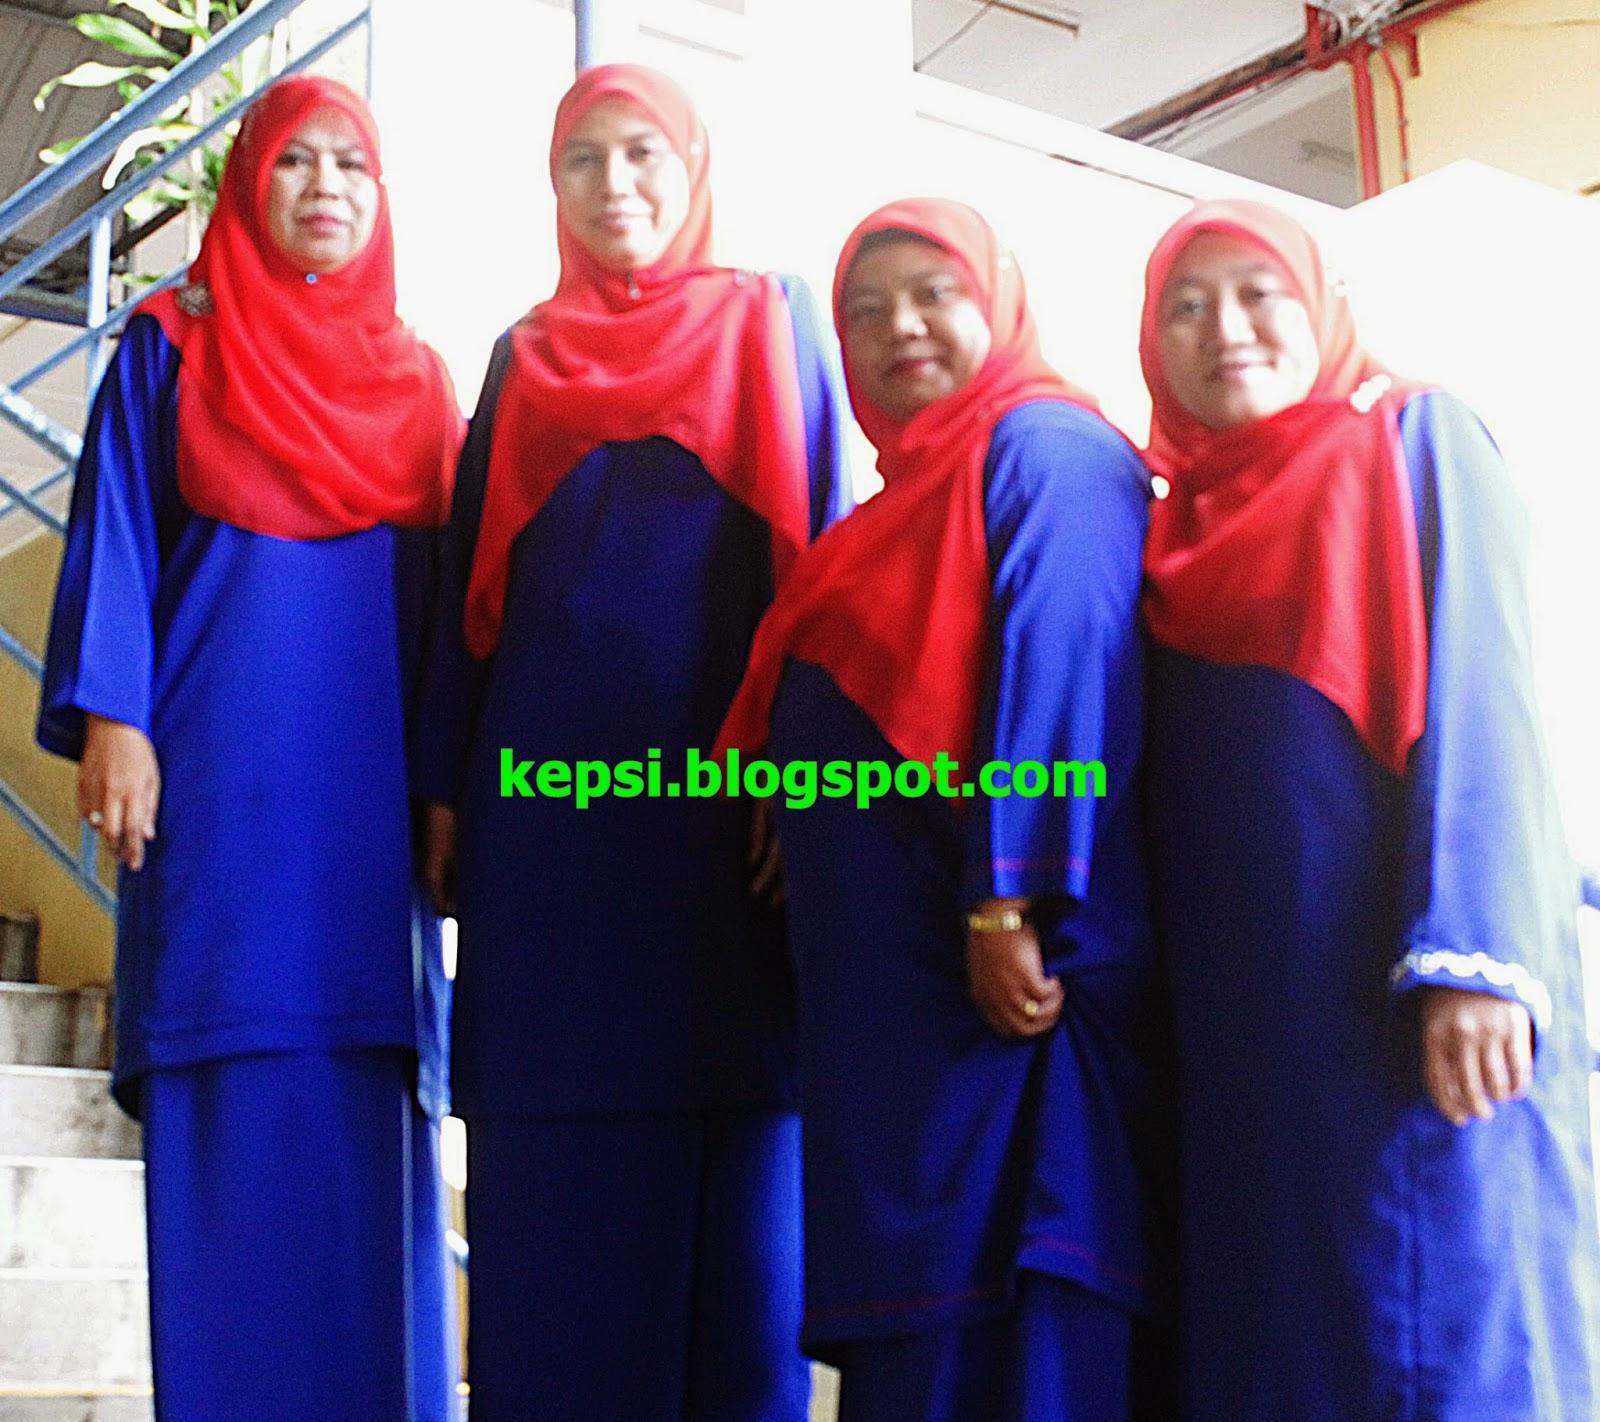 segamat senior personals Department of statistics, malaysia block c6, complex c, federal government administrative centre, 62514, putrajaya tel : 03-8885 7000 fax : 03-8888 9248.